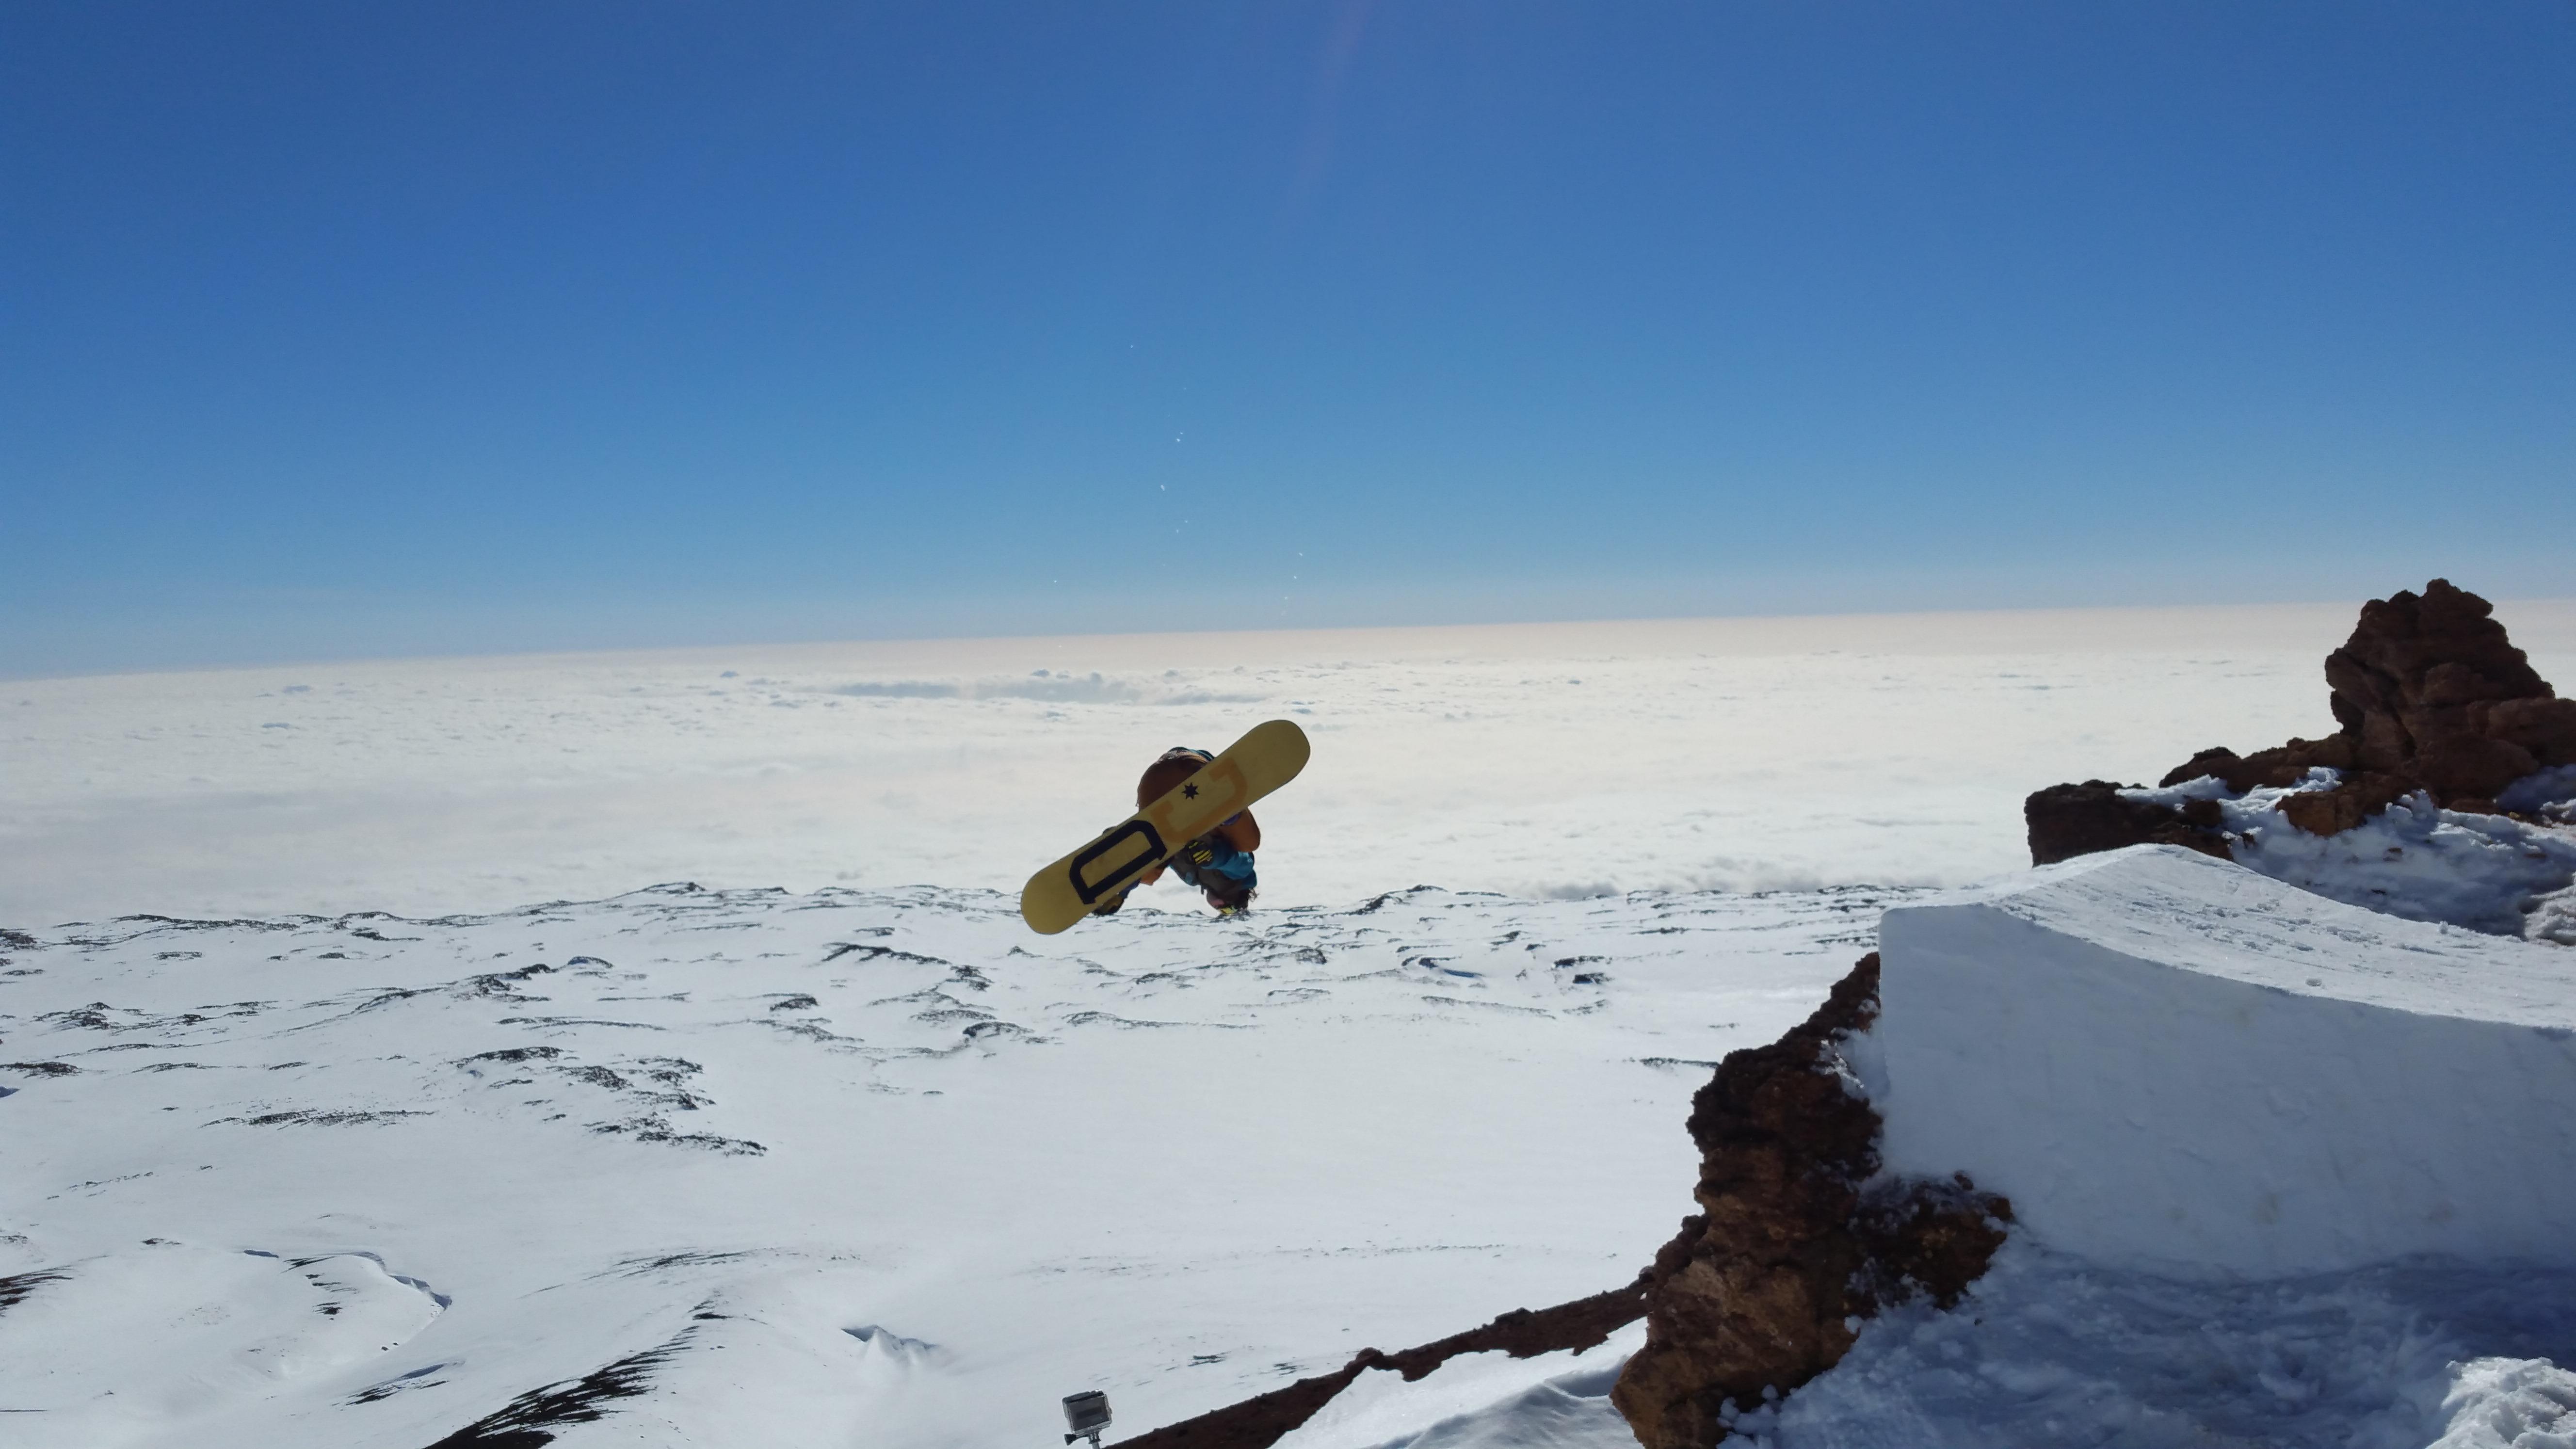 PHOTOS: Mauna Kea & Mauna Loa Snow